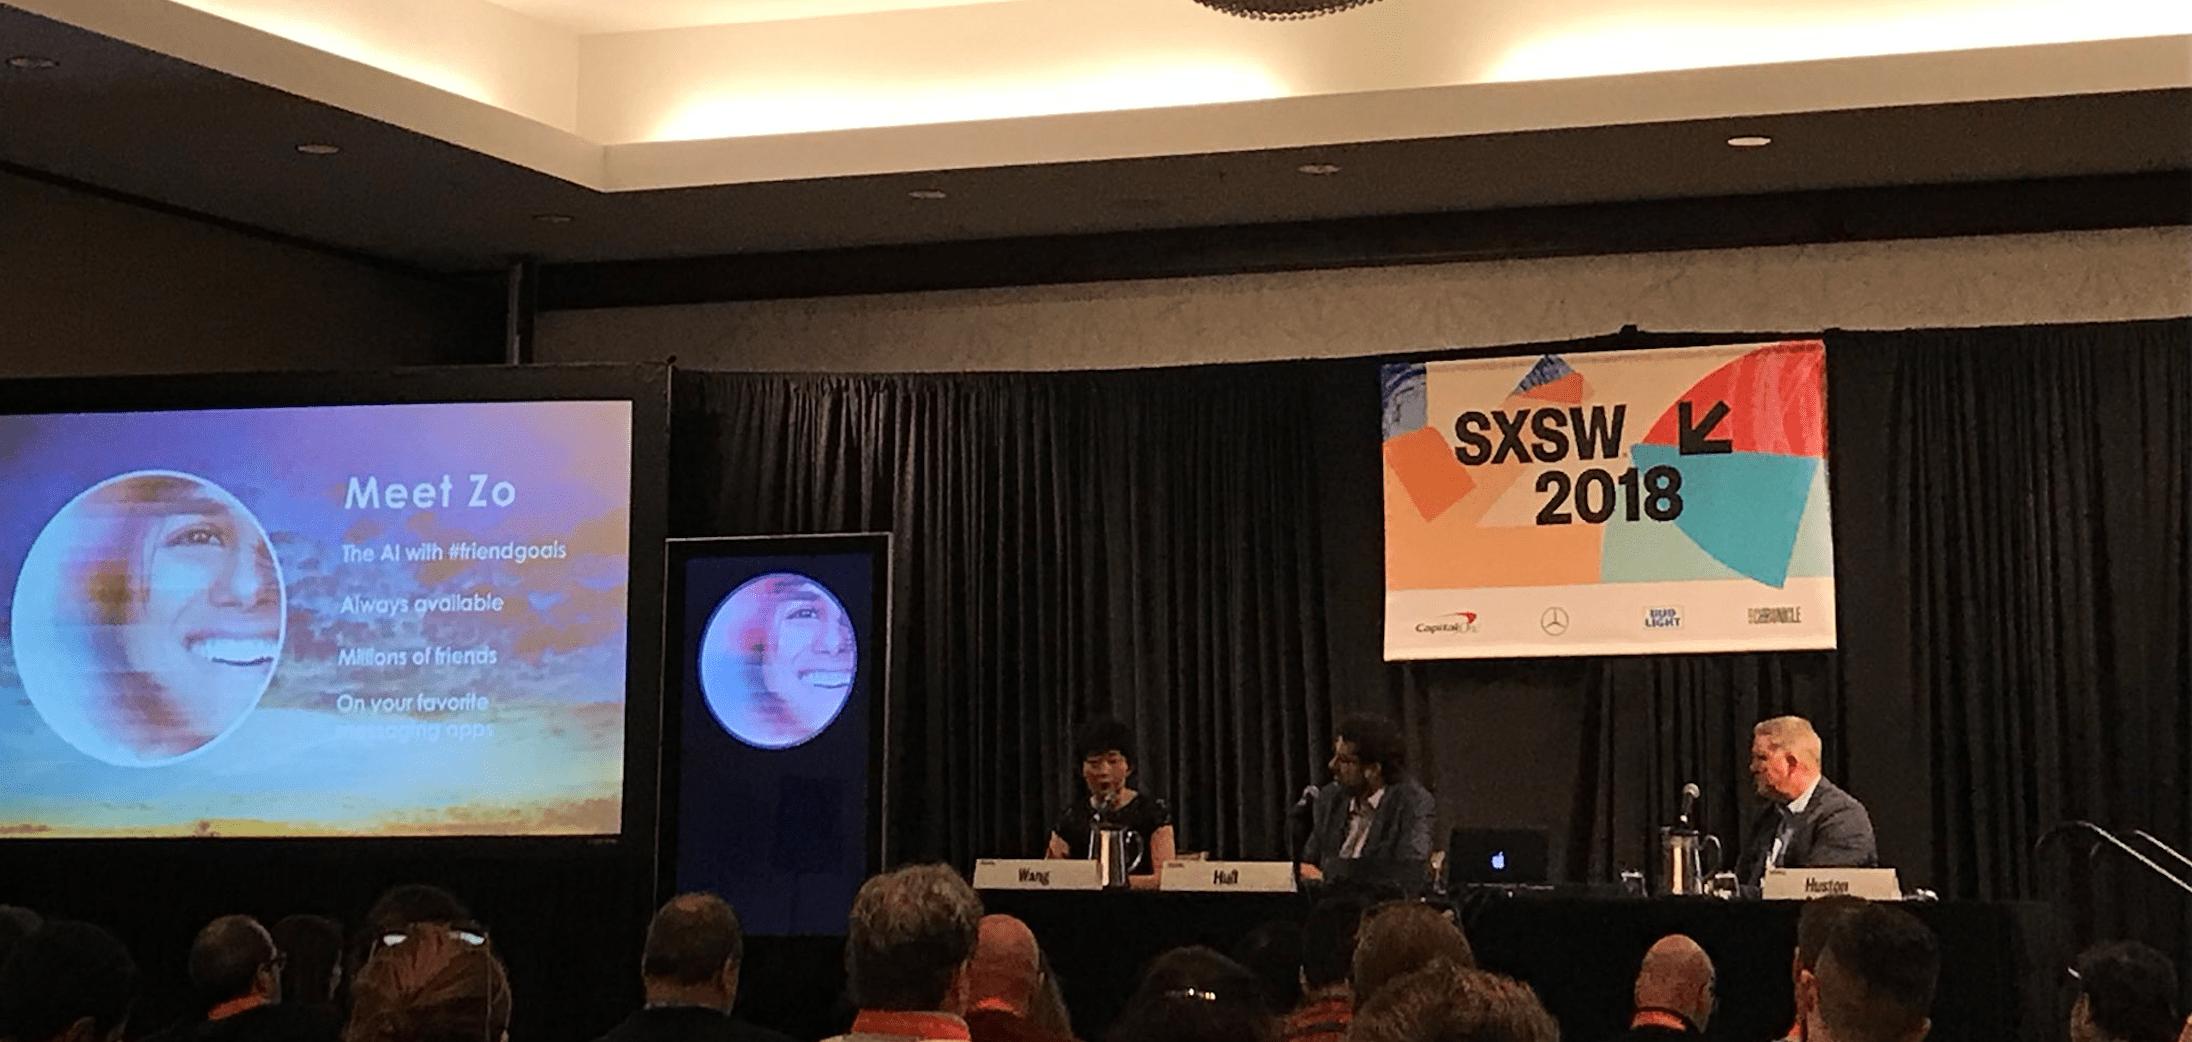 iProspect Brings AI to SxSW